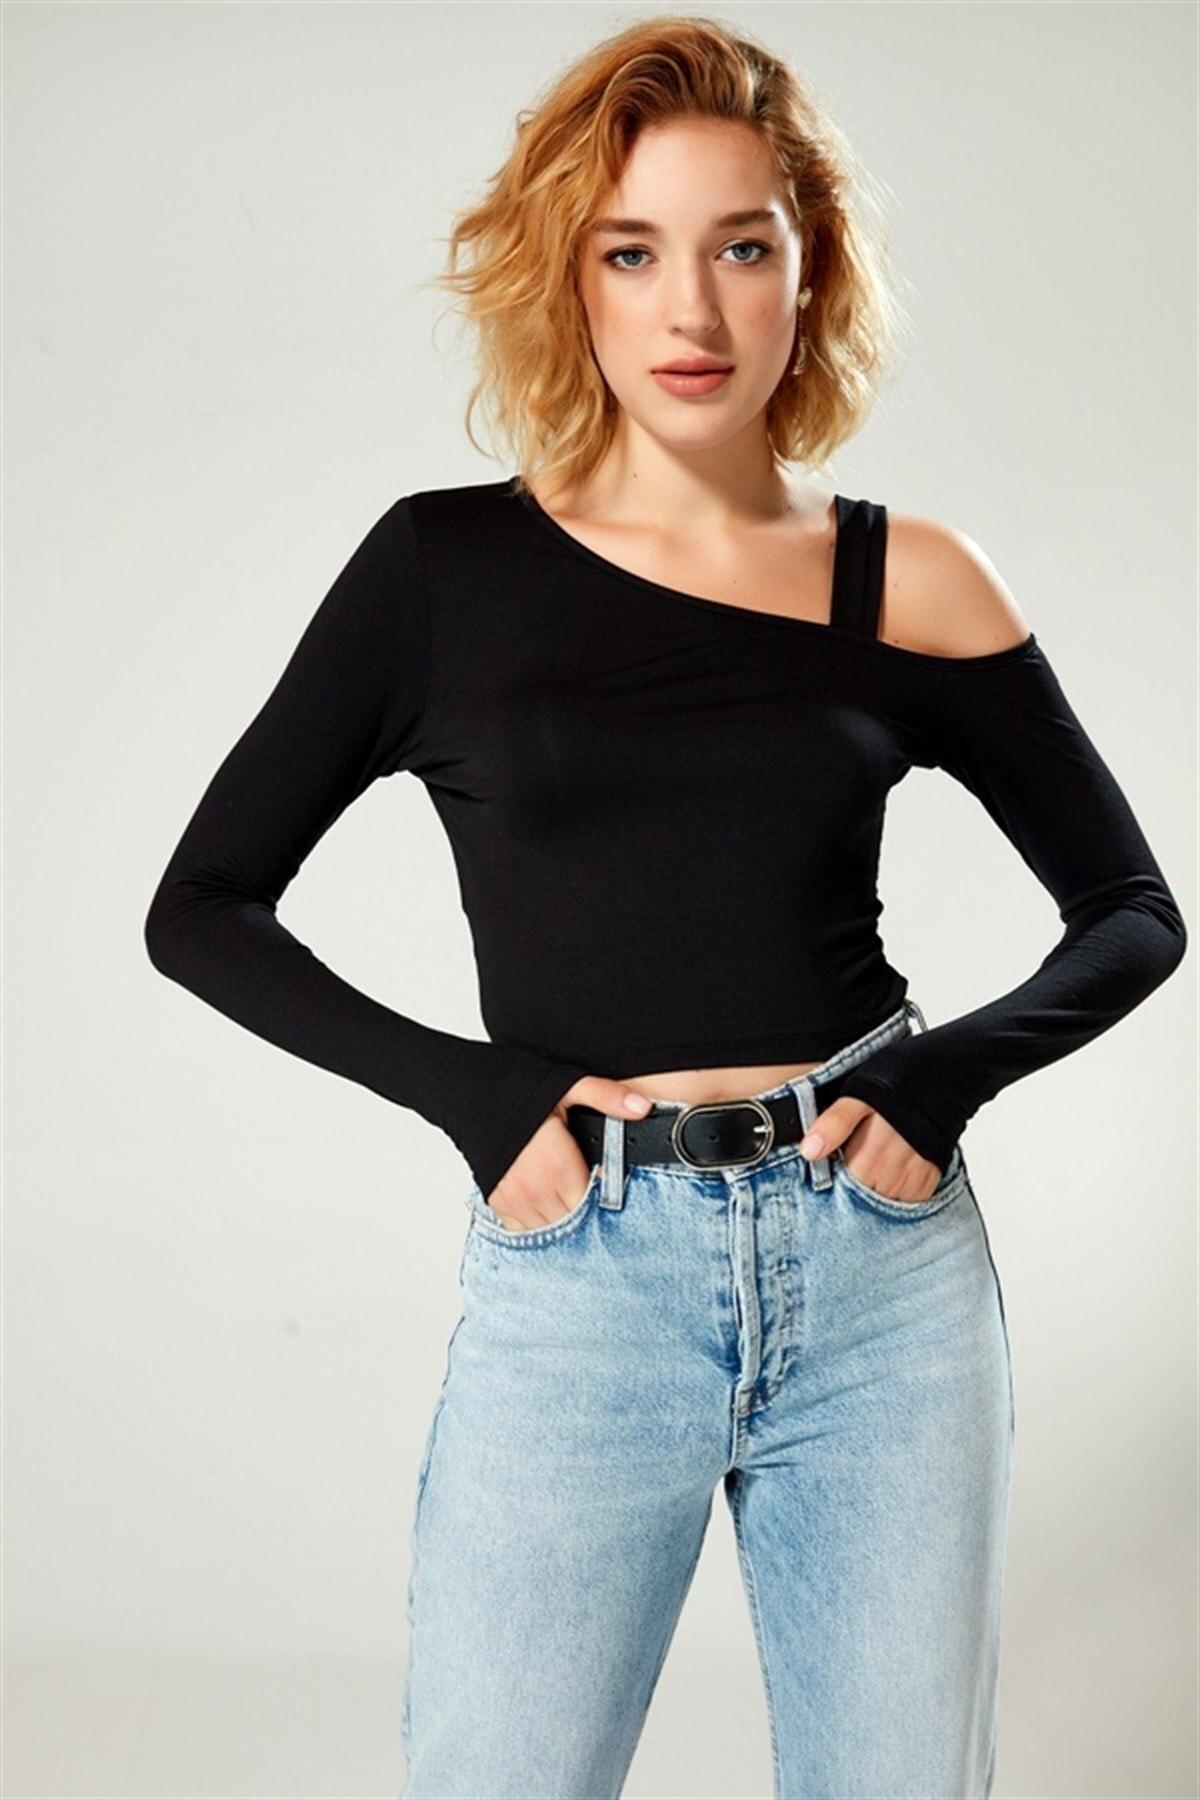 Boutiquen Kadın Siyah Omzu Bantlı Bluz 1241 0